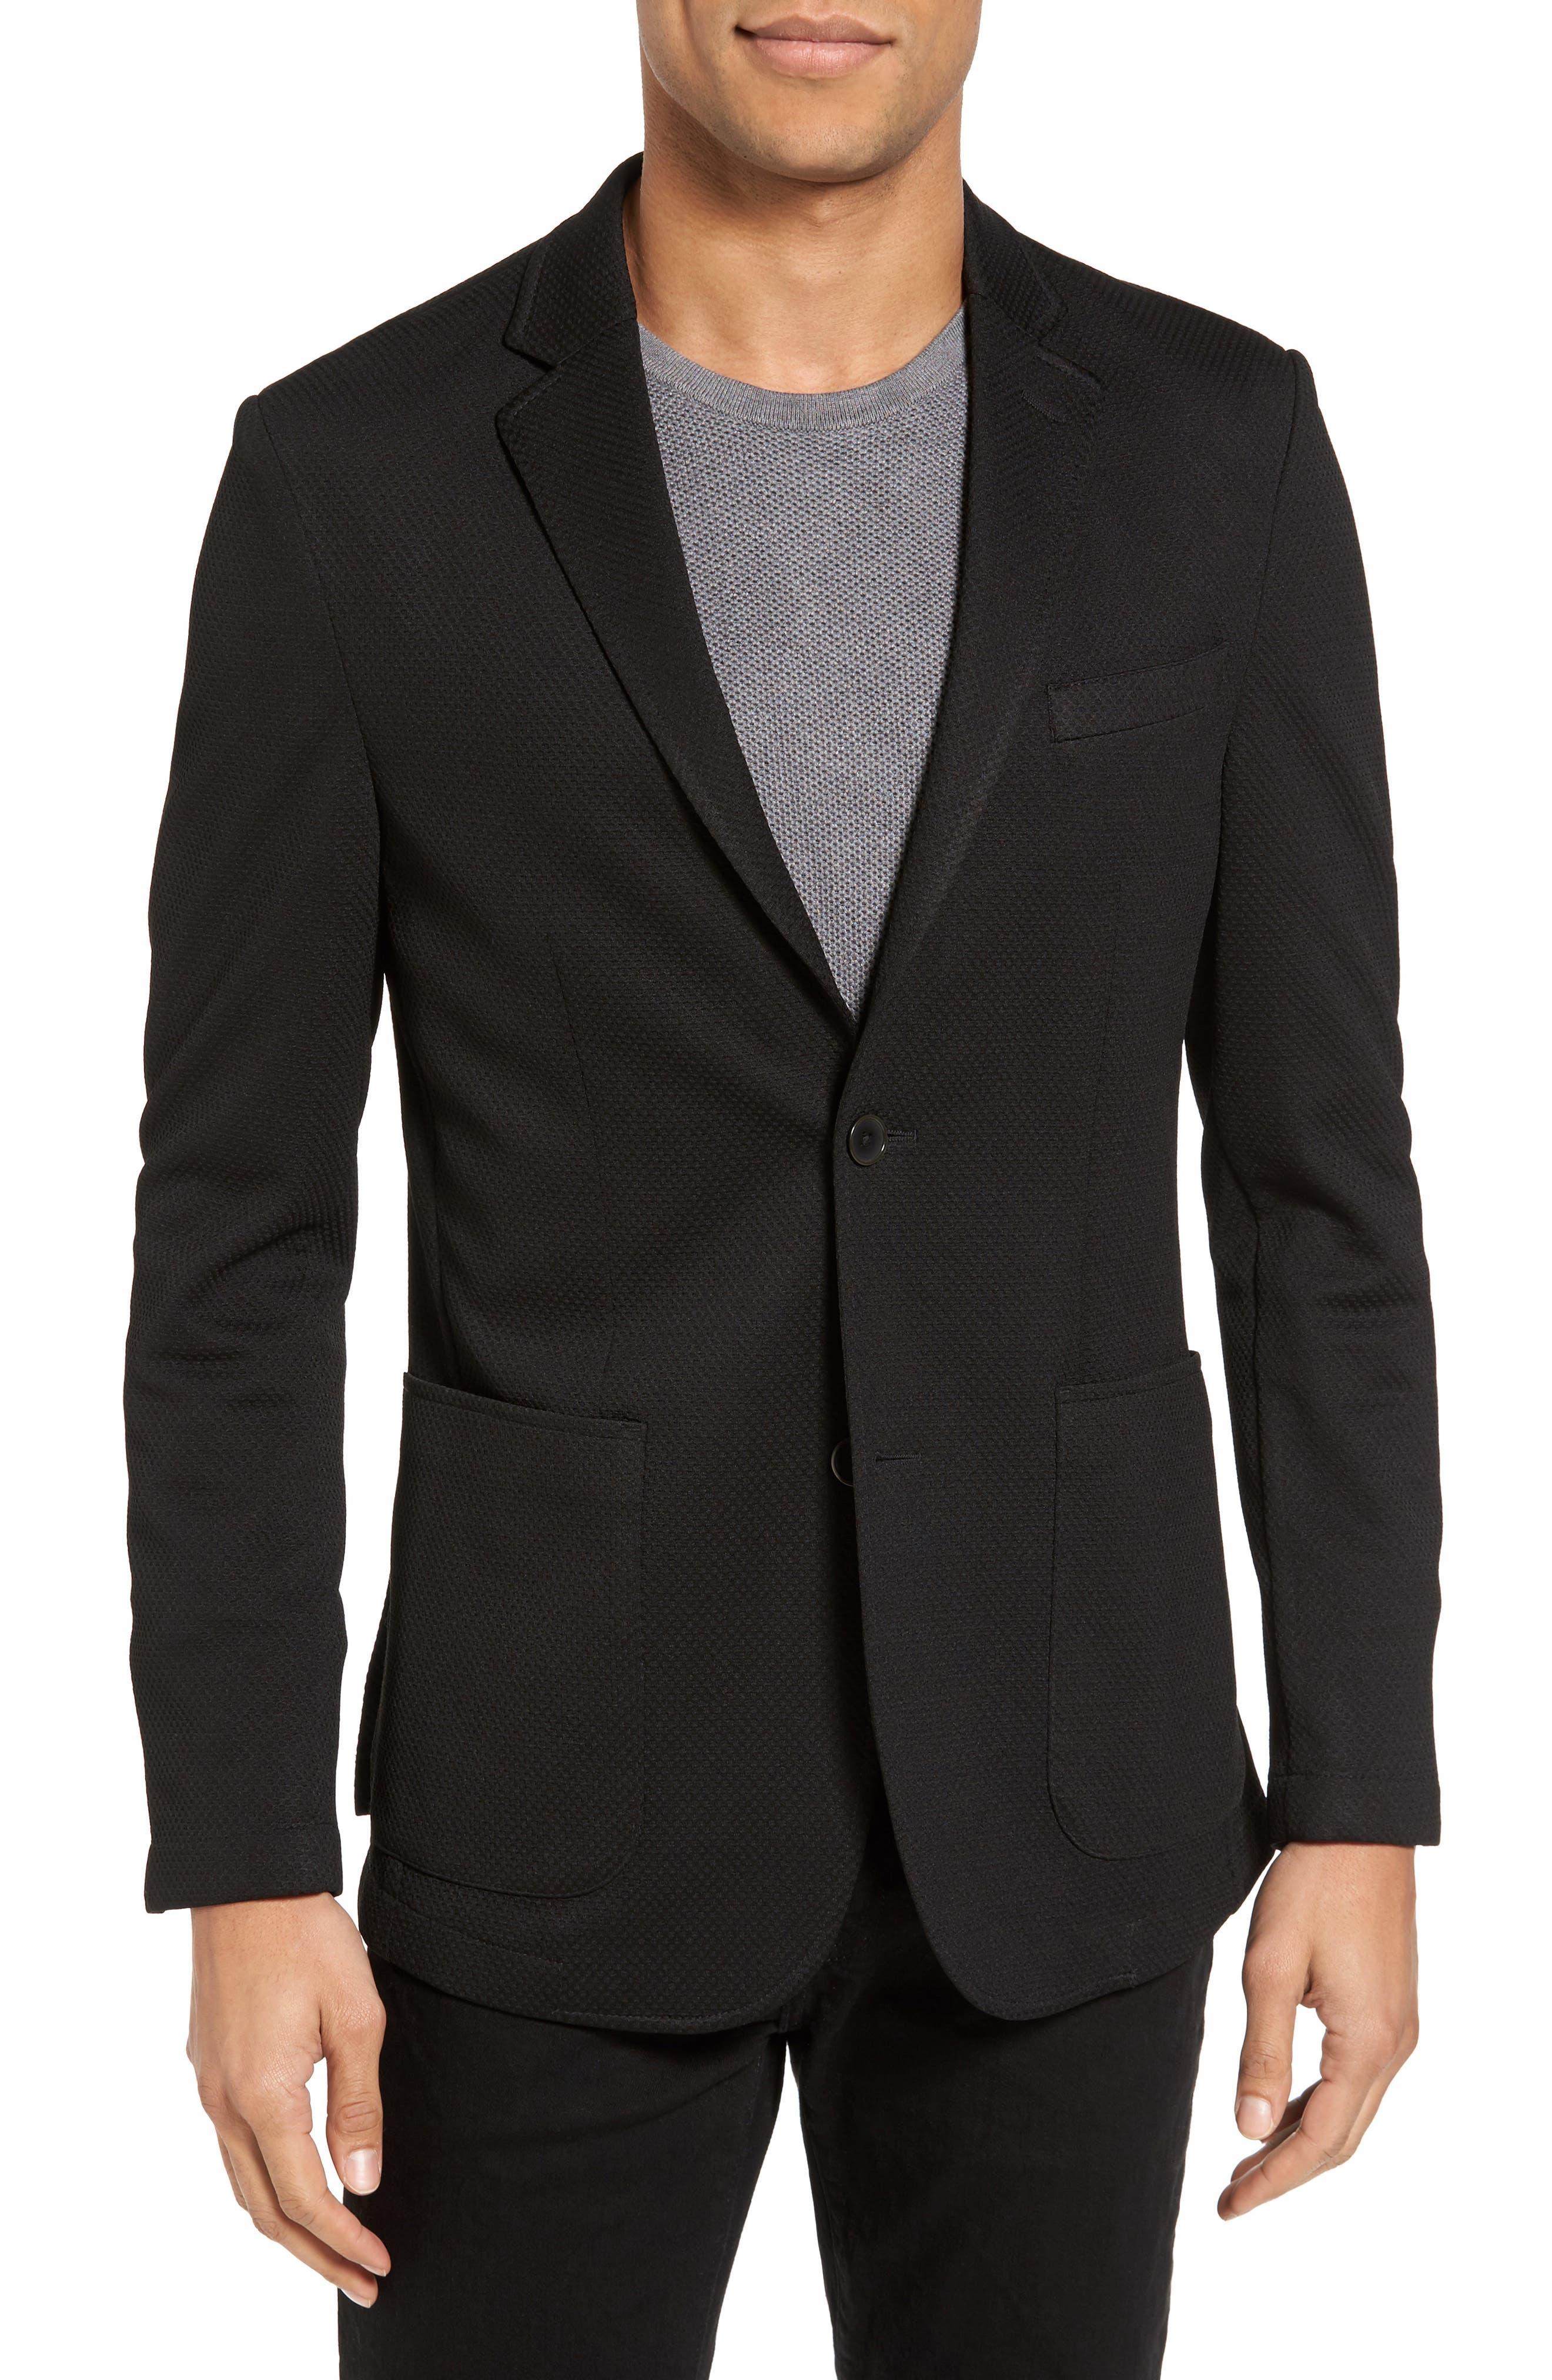 VINCE CAMUTO Slim Fit Stretch Knit Sport Coat, Main, color, BLACK